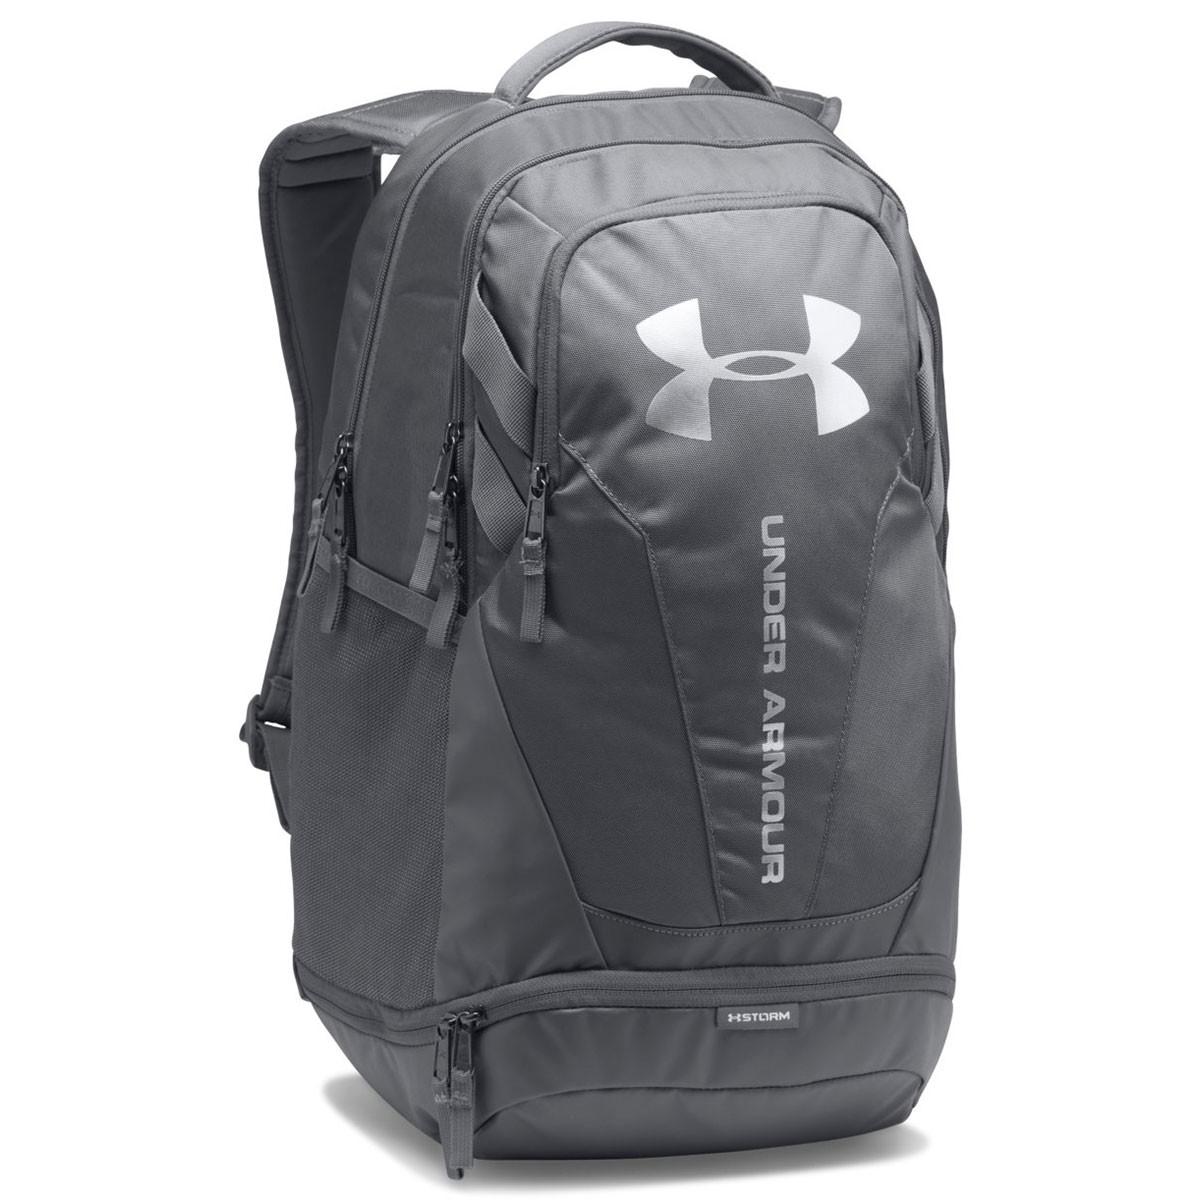 28d3a6029a Under Armour 2019 UA Hustle 3.0 Backpack Rucksack